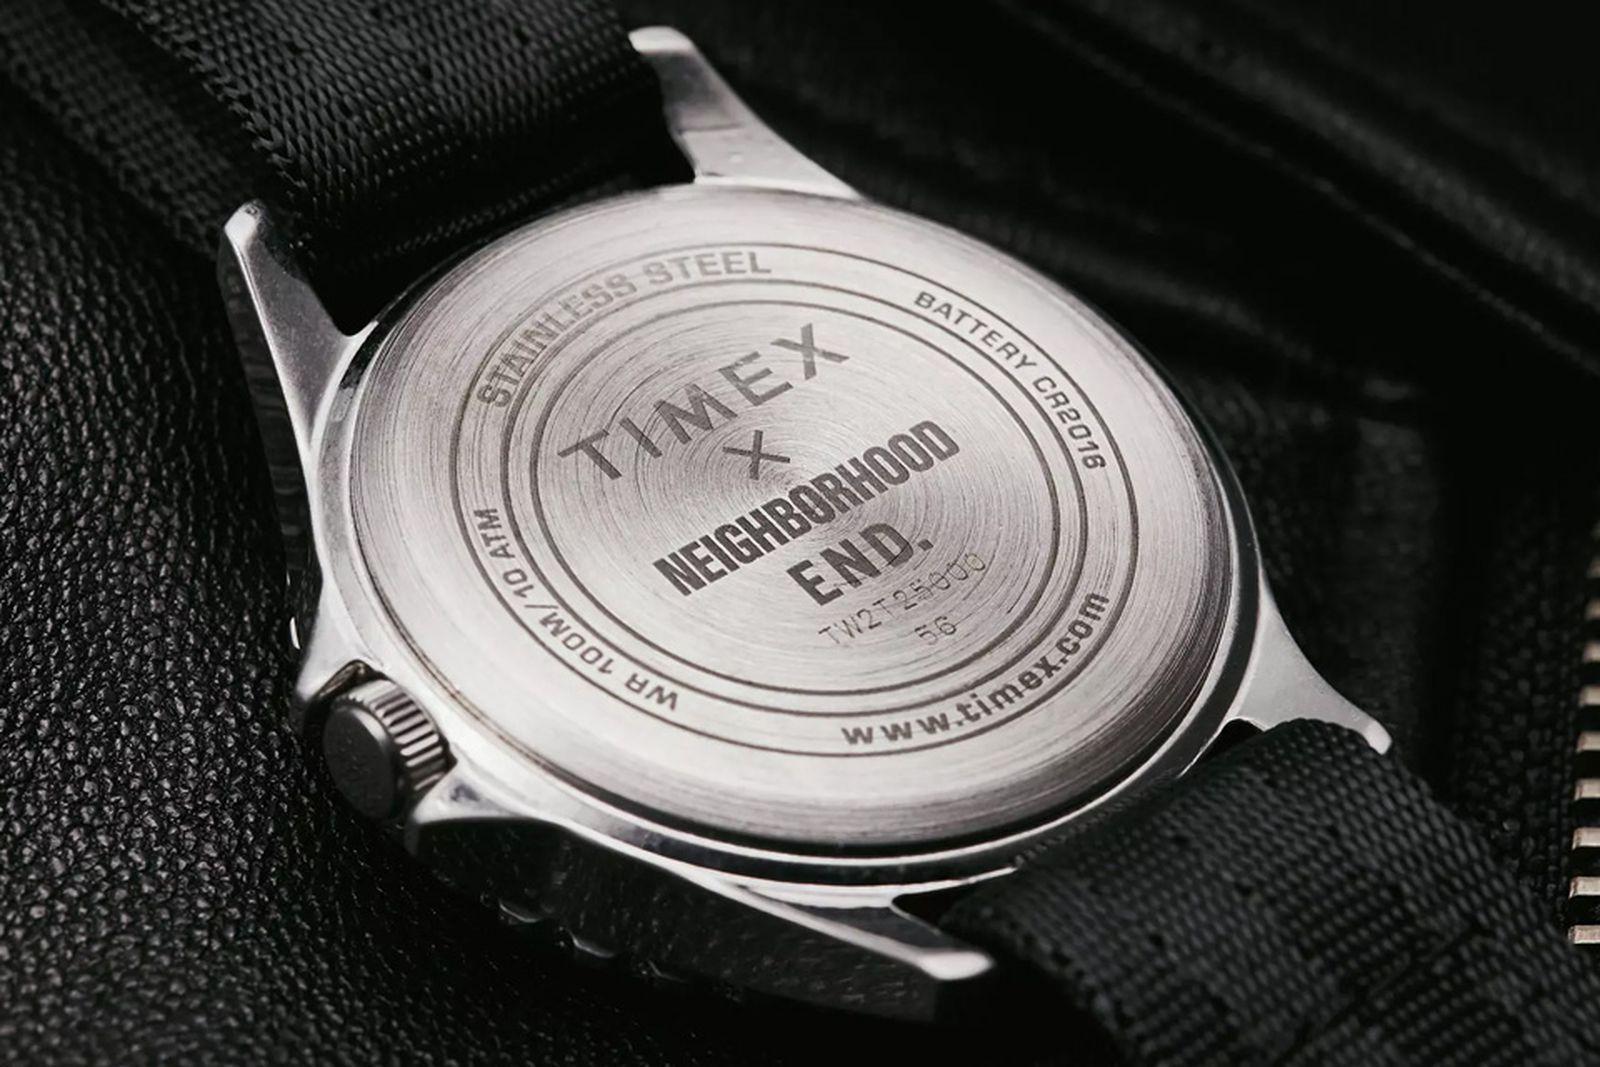 end time x neighborhood 18004 watch03 timex